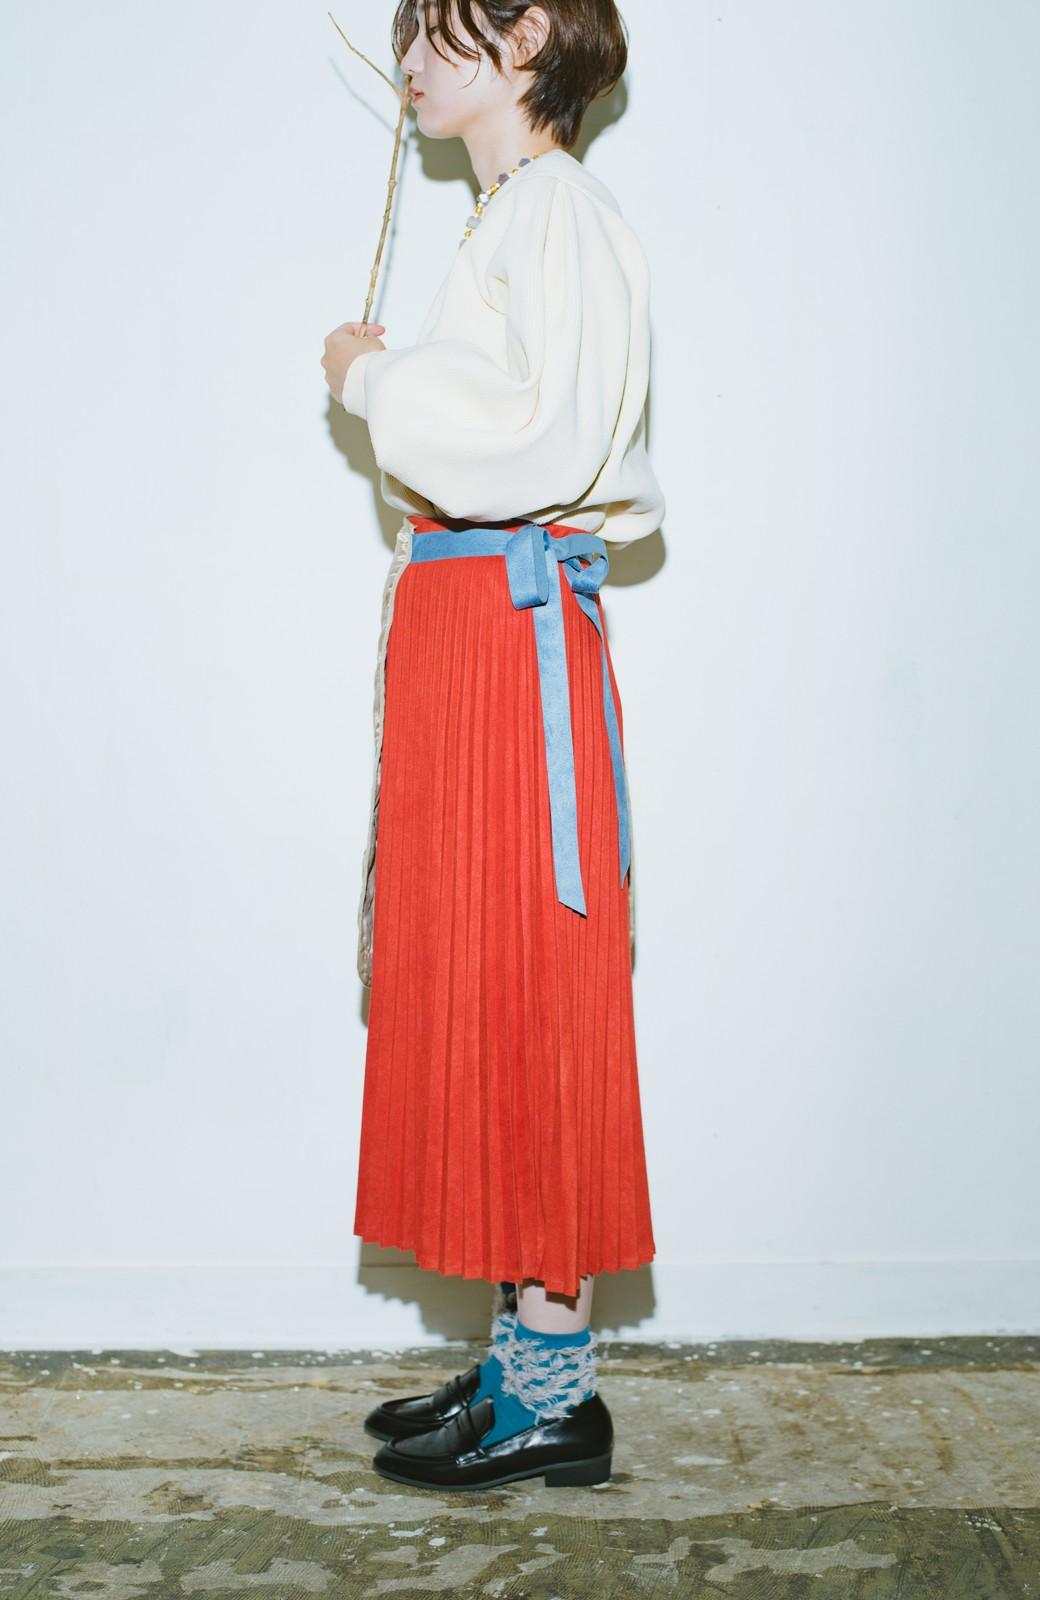 haco! haco! × RBTXCO  着回したっくさん!エプロン風巻きスカート <オレンジ系その他>の商品写真6